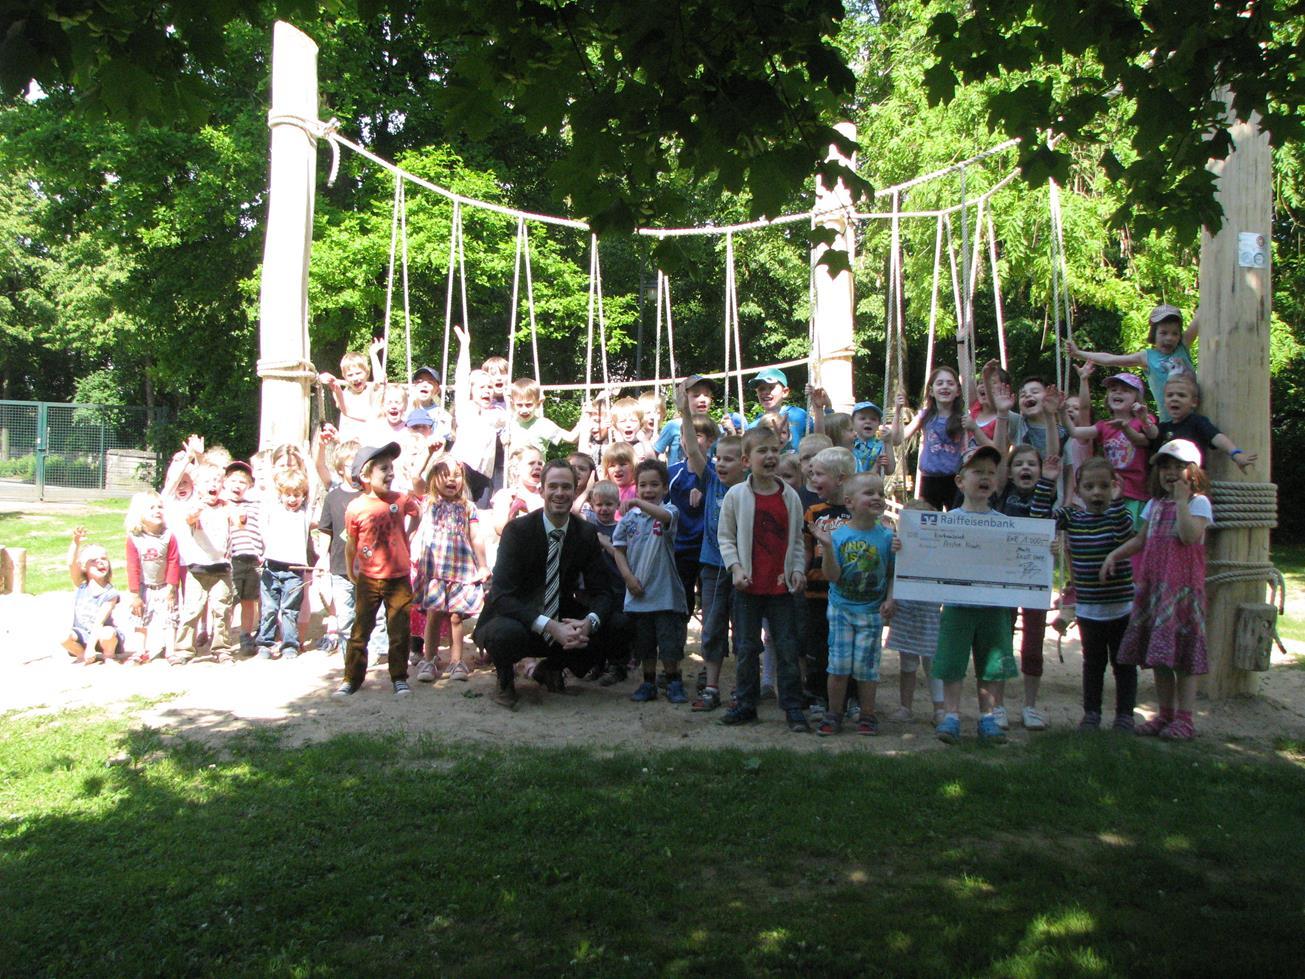 Arche Noah Klettergerüst : Schwingen hangeln balancieren u kindertagesstätte earche noah